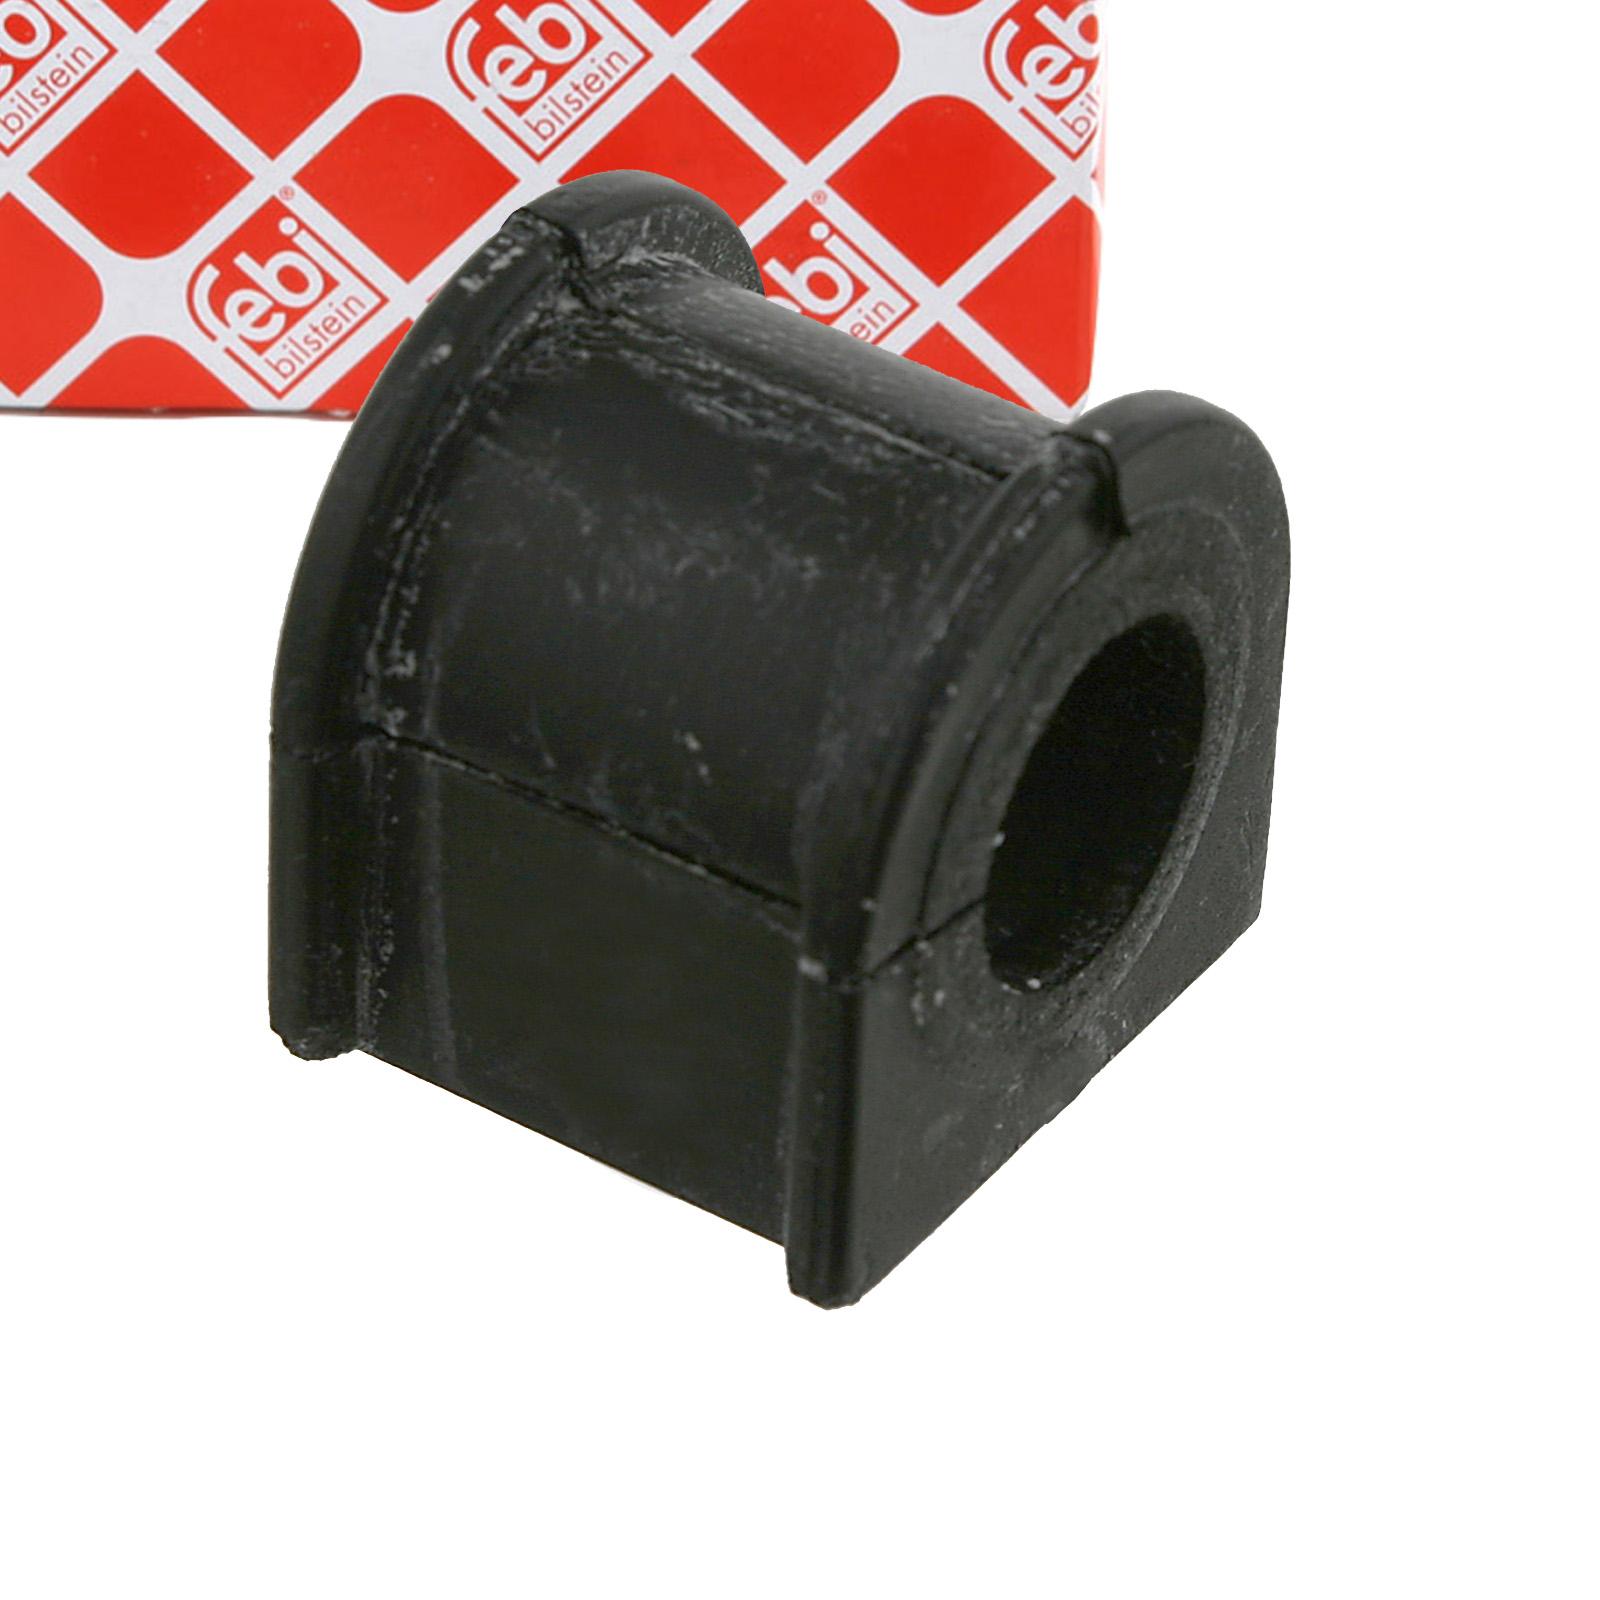 2x FEBI 24916 Stabilisatorlager FORD Mondeo 1 MK1 2 MK2 hinten 7144204